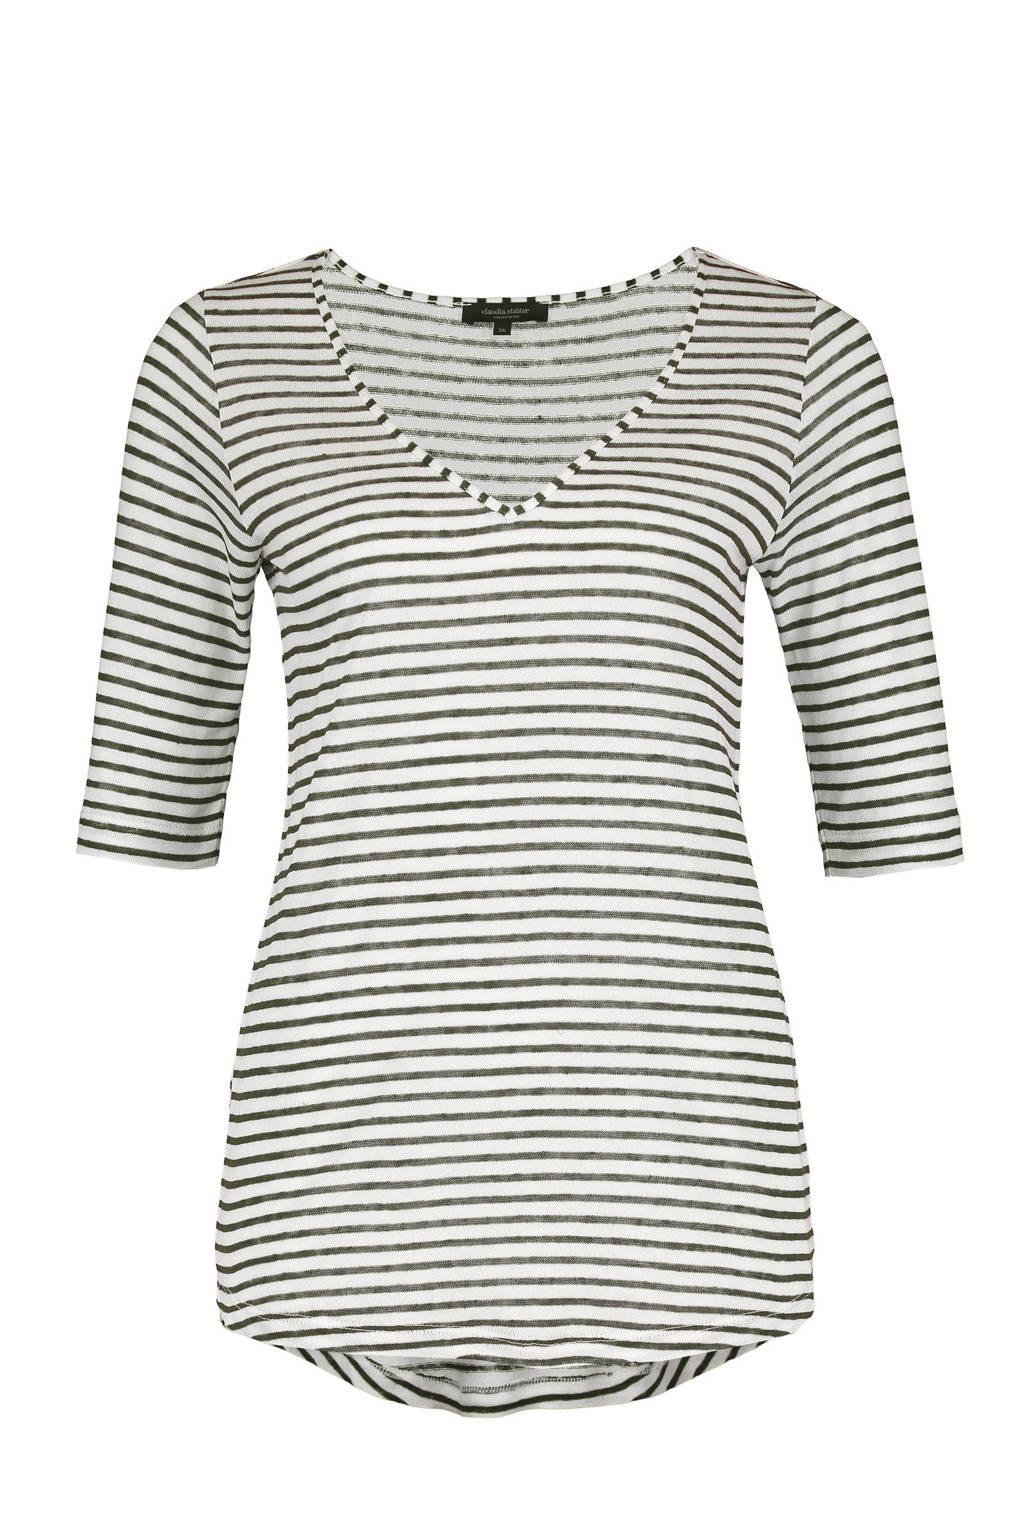 Claudia Sträter gestreept T-shirt met linnen ecru/grijs, Ecru/grijs